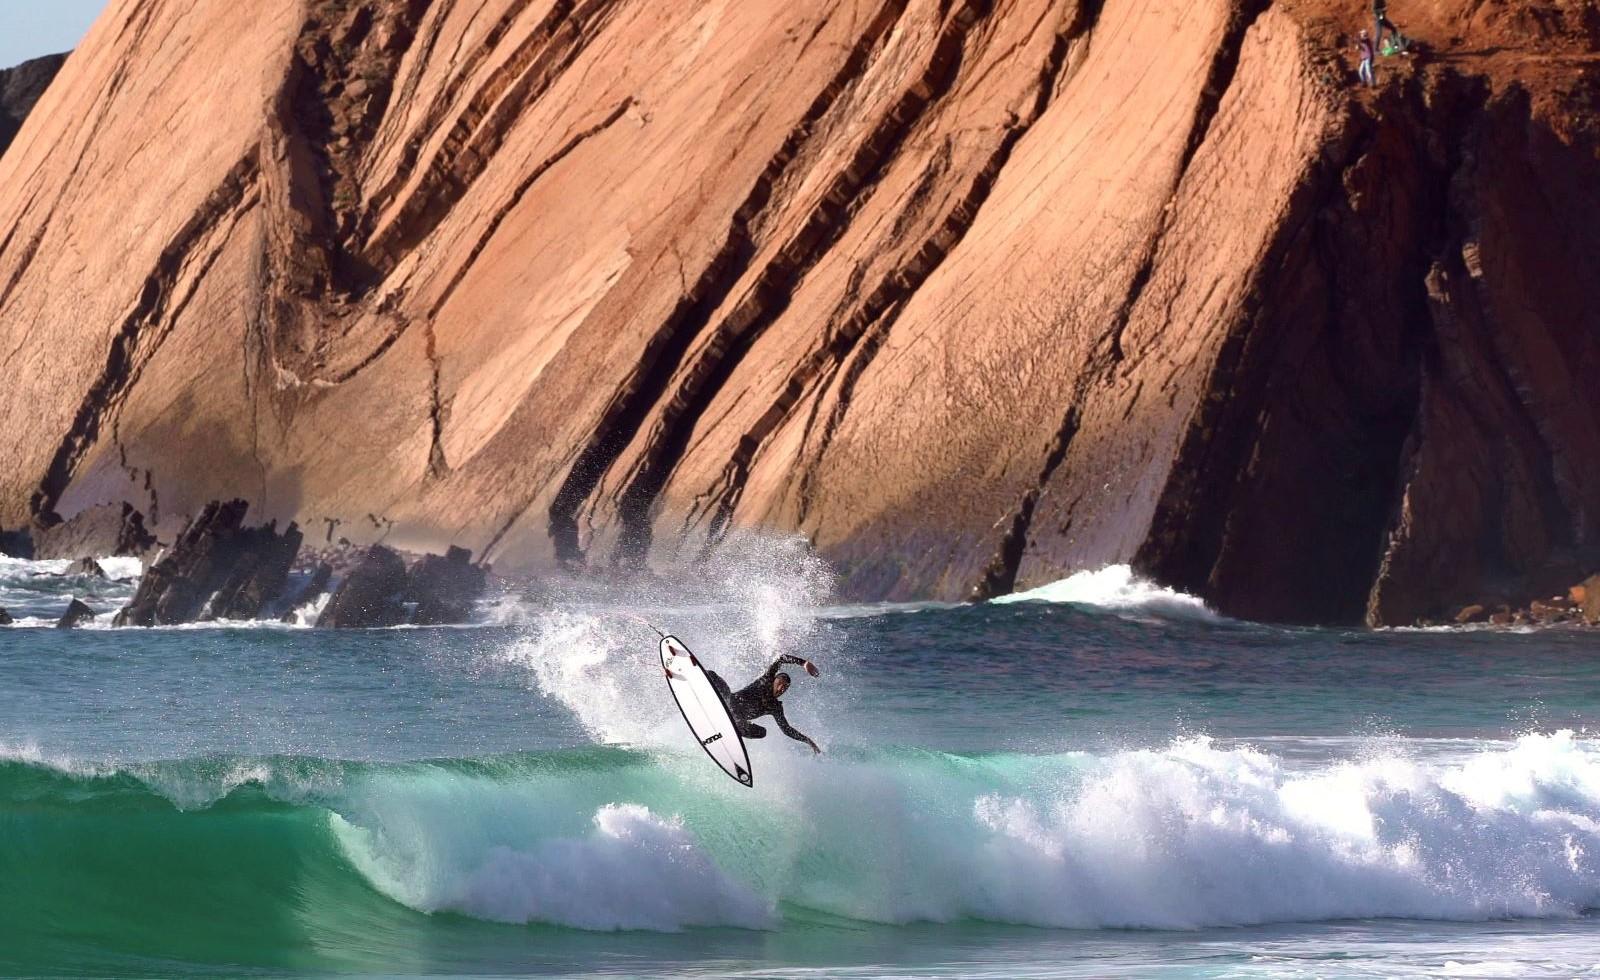 Tom Bellevergue, Portugal-@johnduquoc